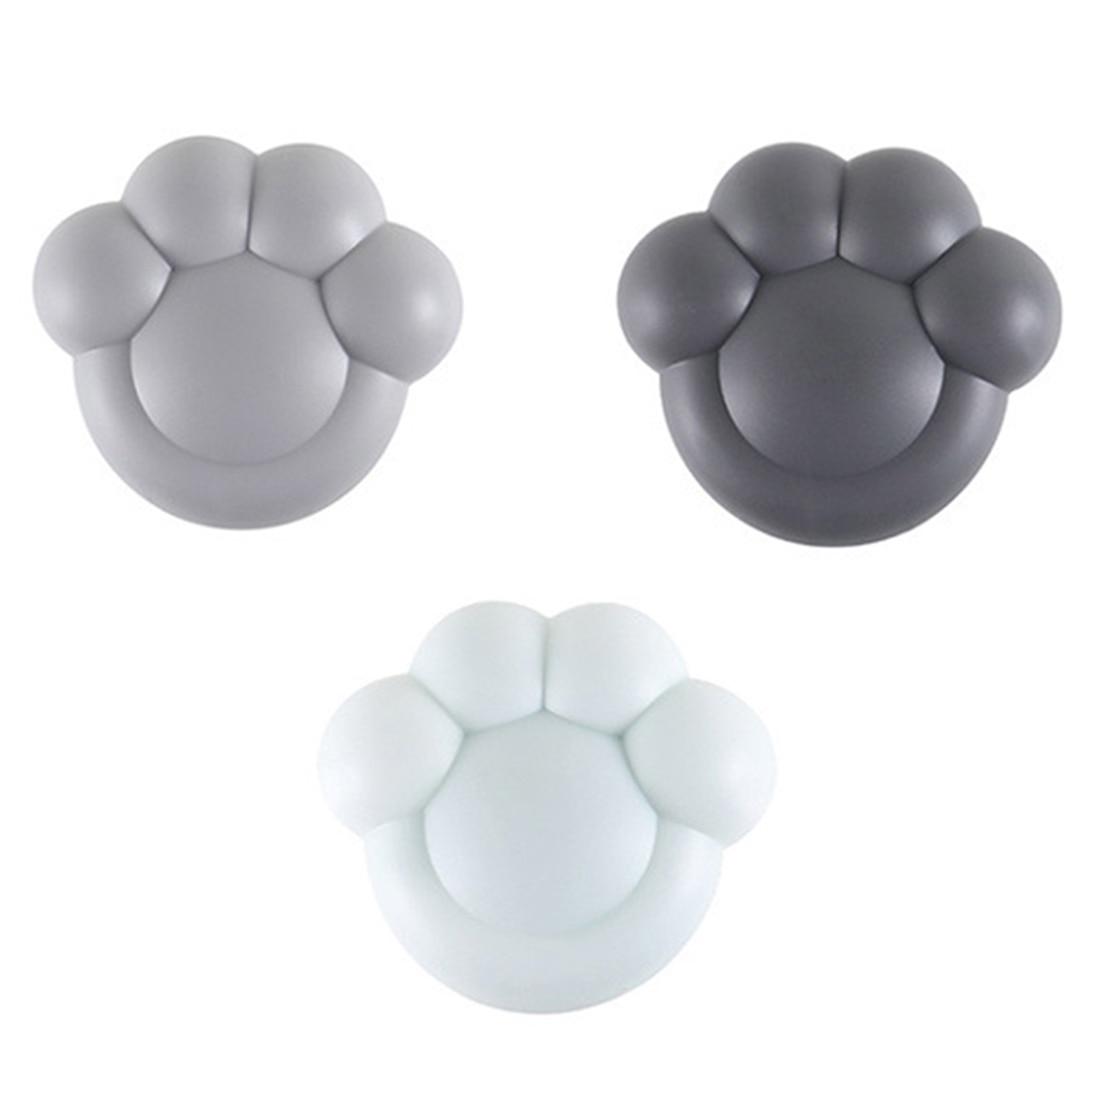 1/3/6pcs Bear Paw Shape Air Purifier Refrigerator Smell Remover Freshener Shoe Wardrobe Deodorant Box - Random Color